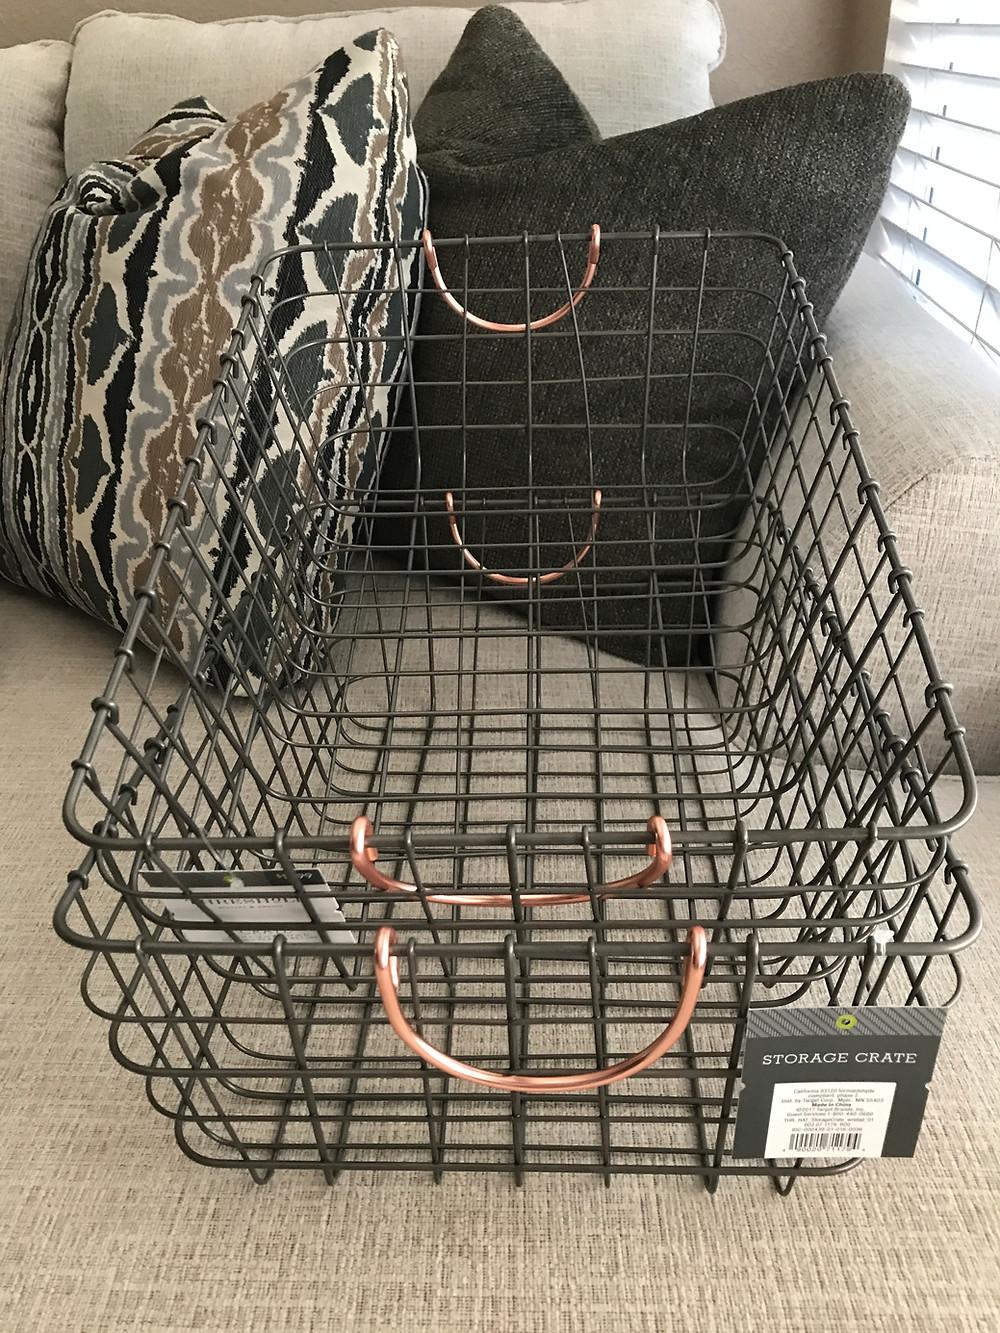 Stylish Organization with Wire Baskets